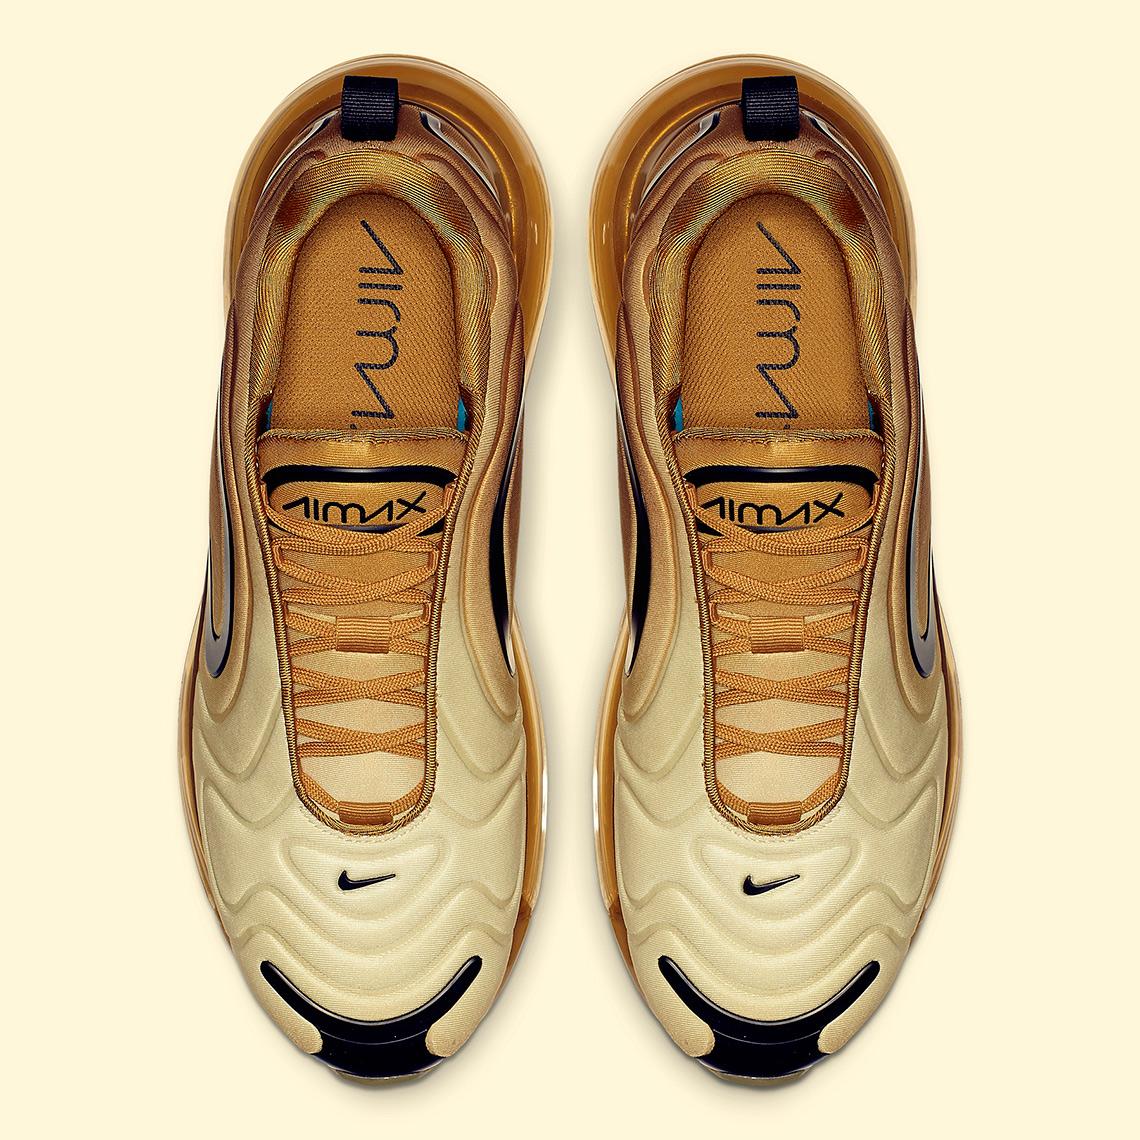 5d4d1ce723d5f Nike Air Max 720 Gold AO2924-700 Release Info